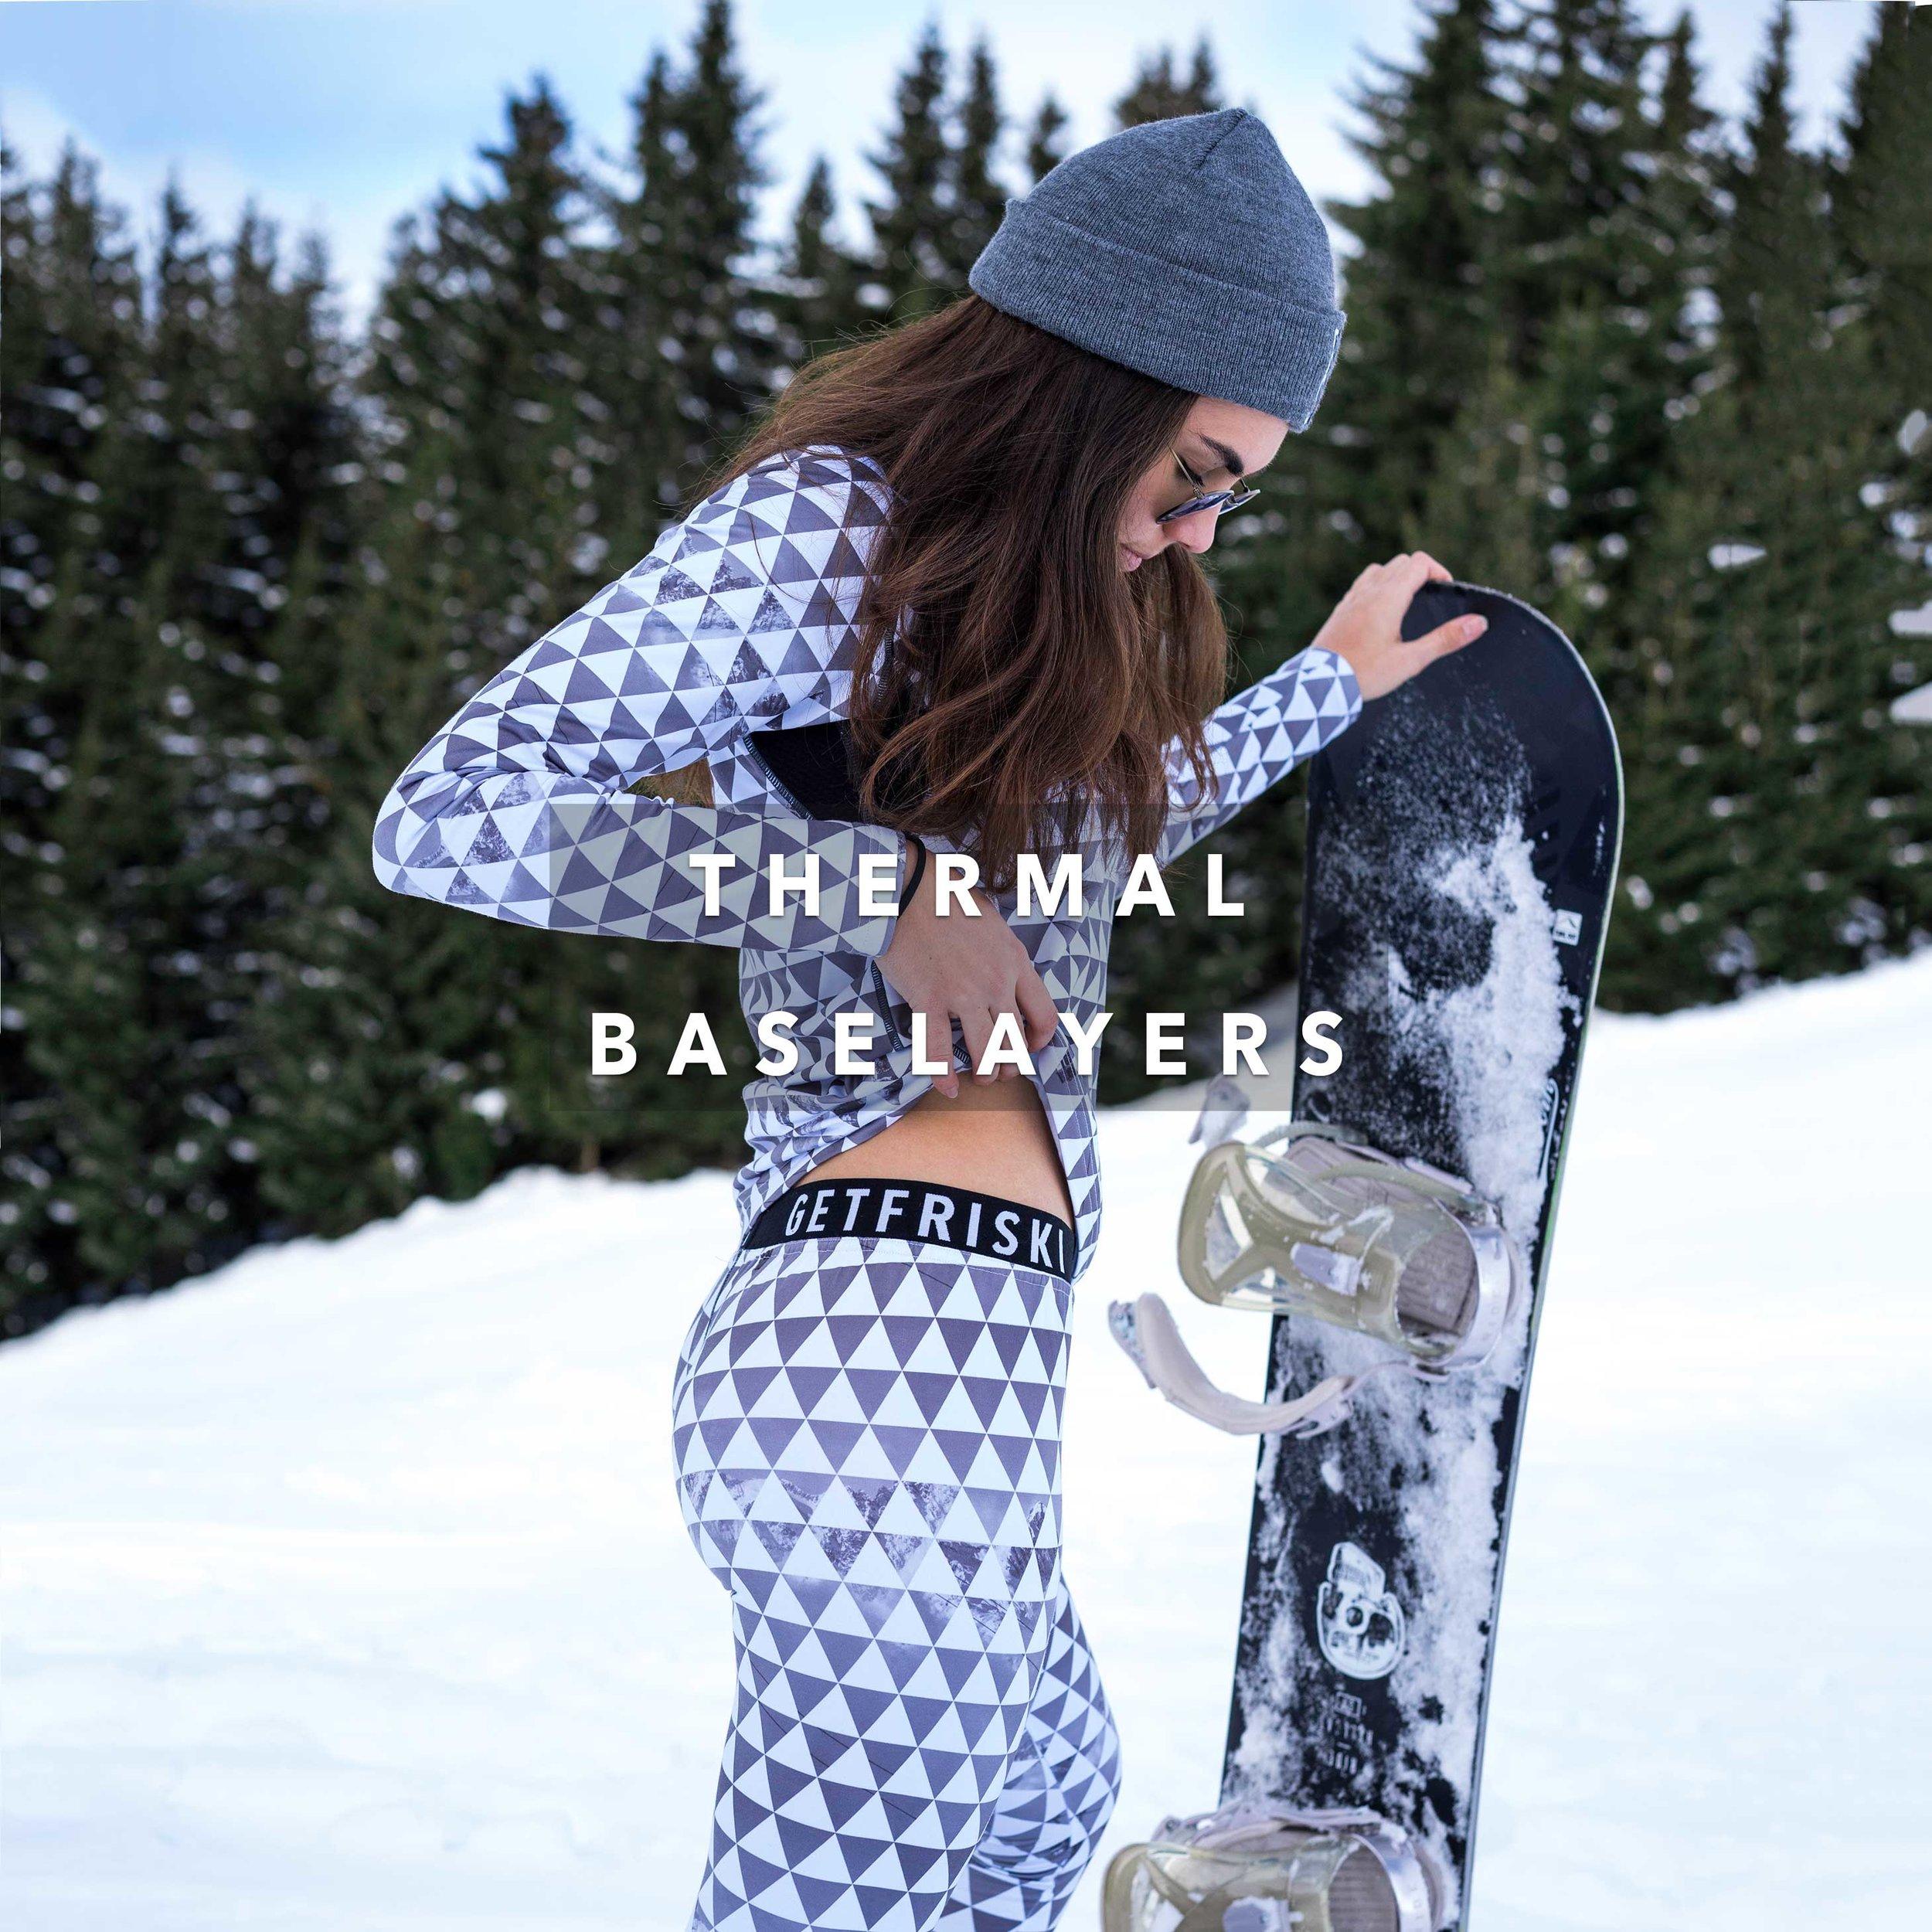 Friski Wear Thermal Base layers